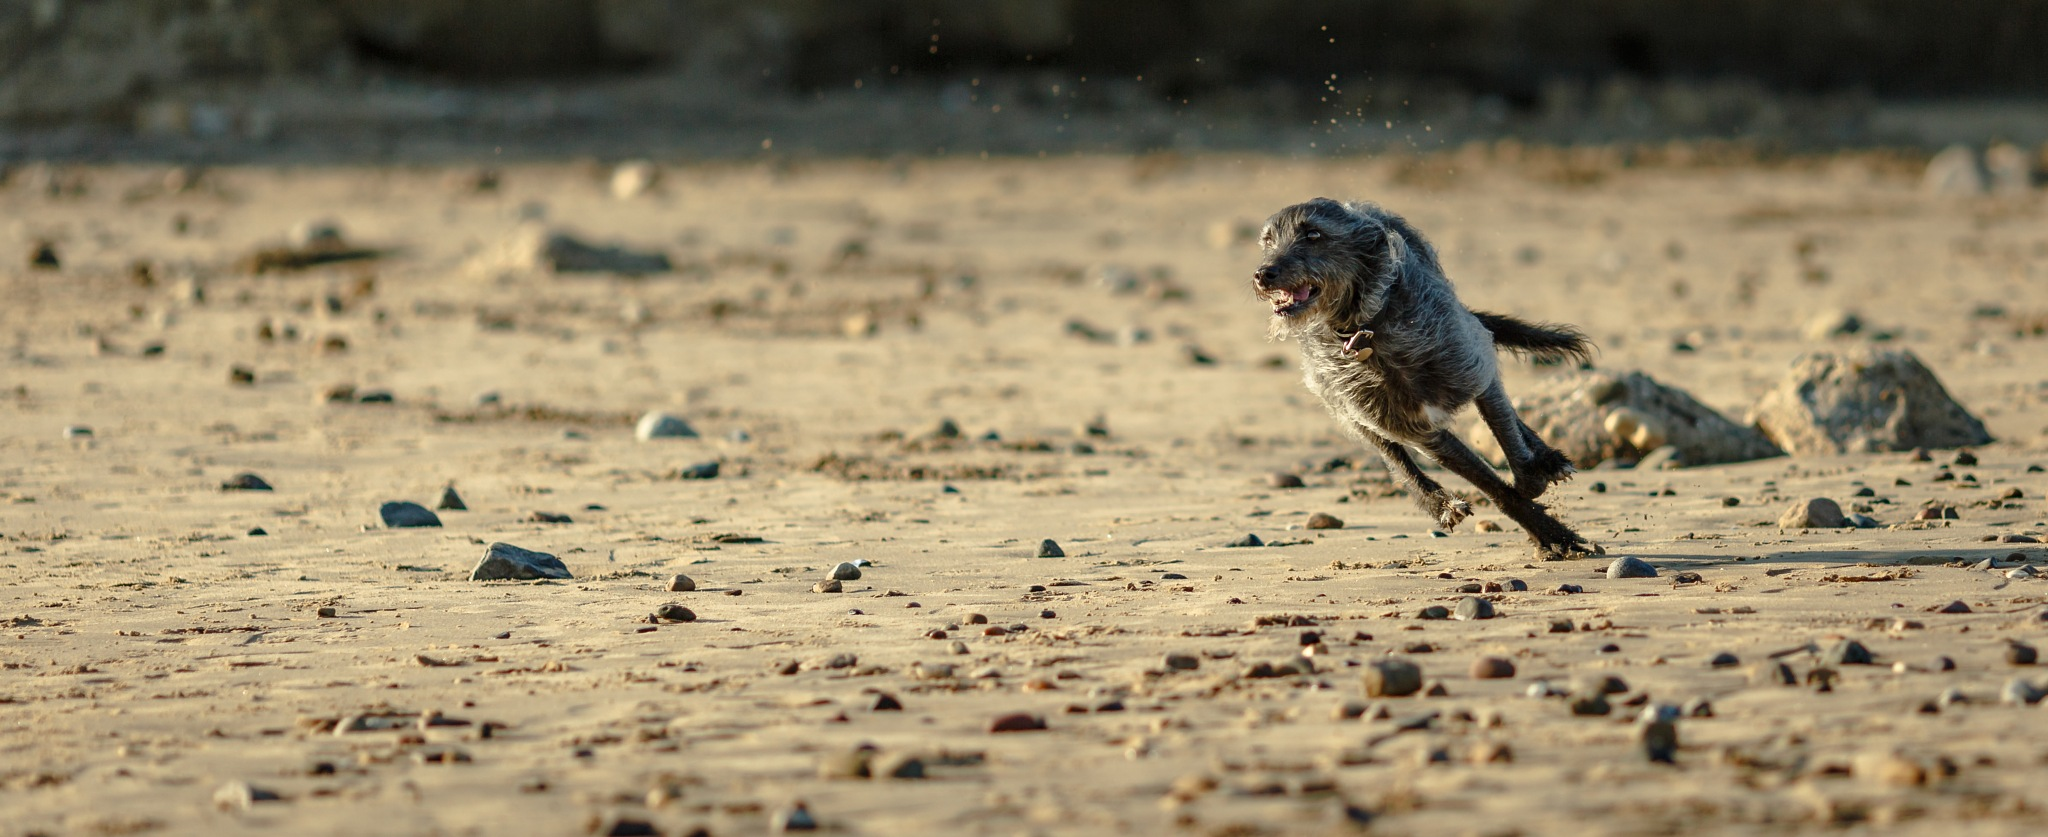 Zoomy Zedd on the beach by Gina Rayment